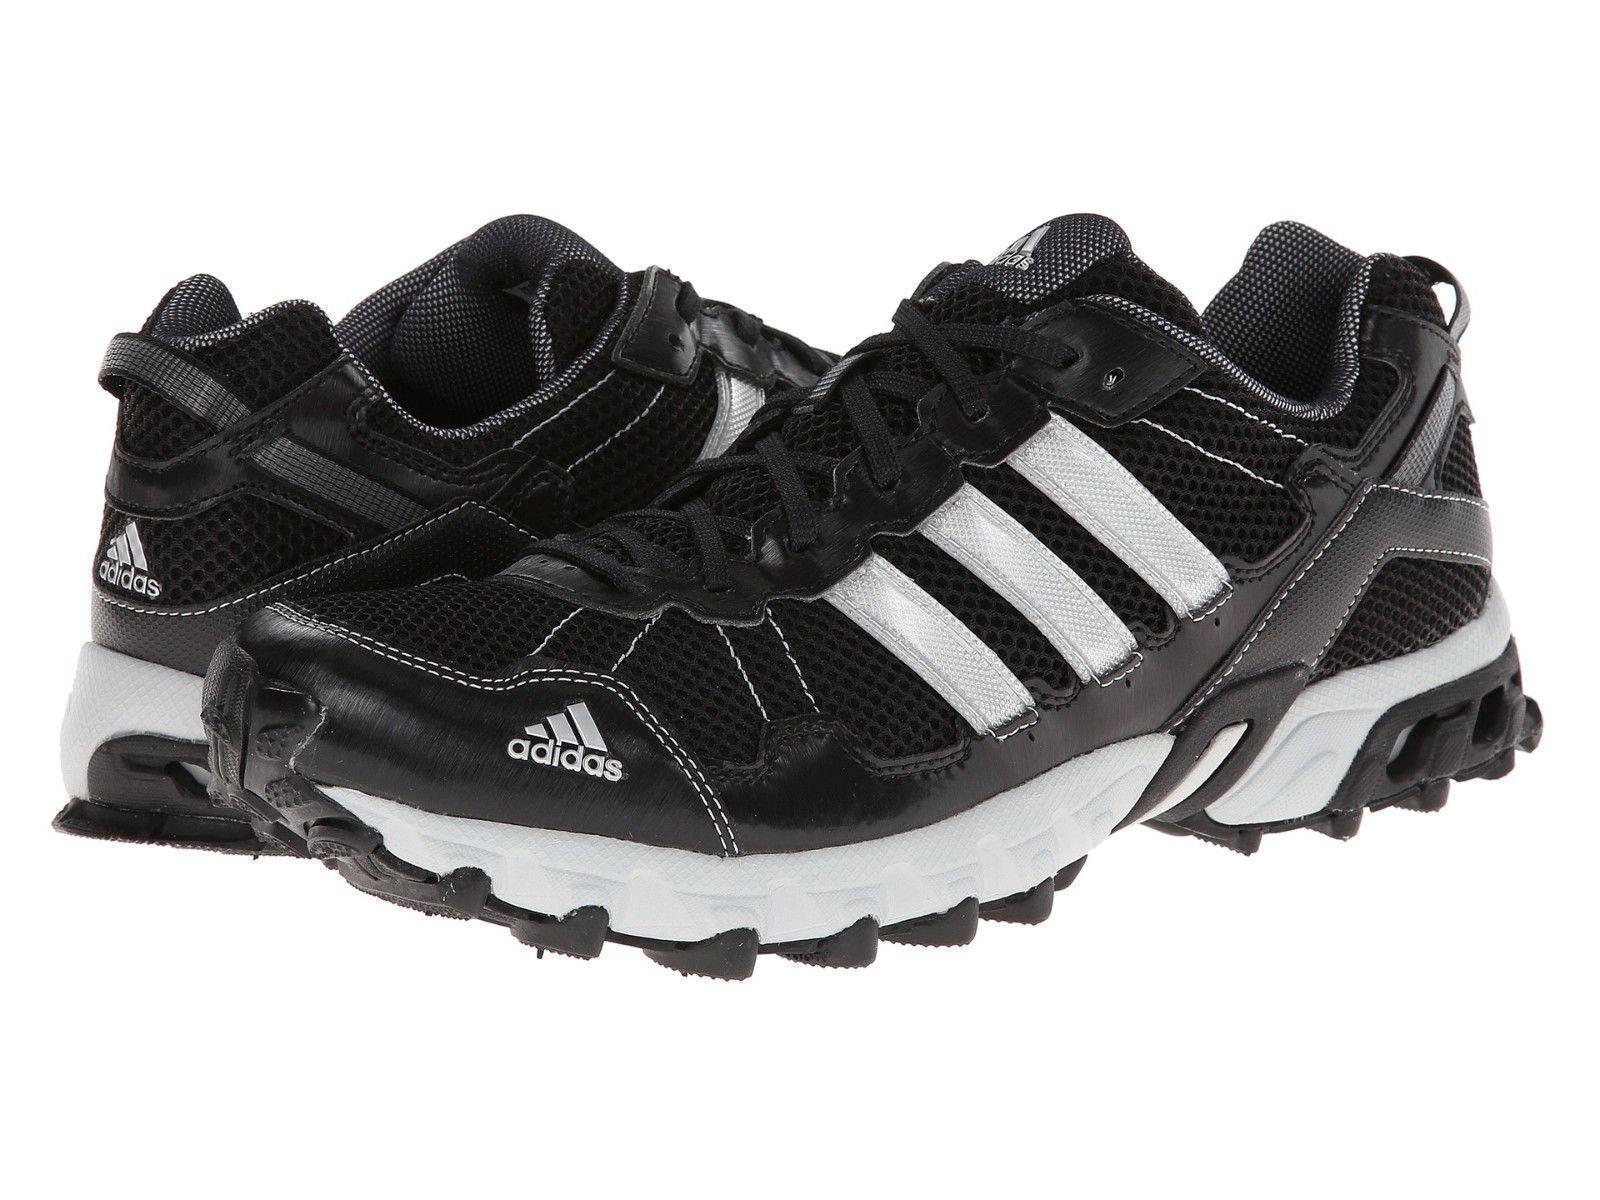 adidas Performance Mens Thrasher 1.1 M Trail Running Shoe Sizes 7 thru 15